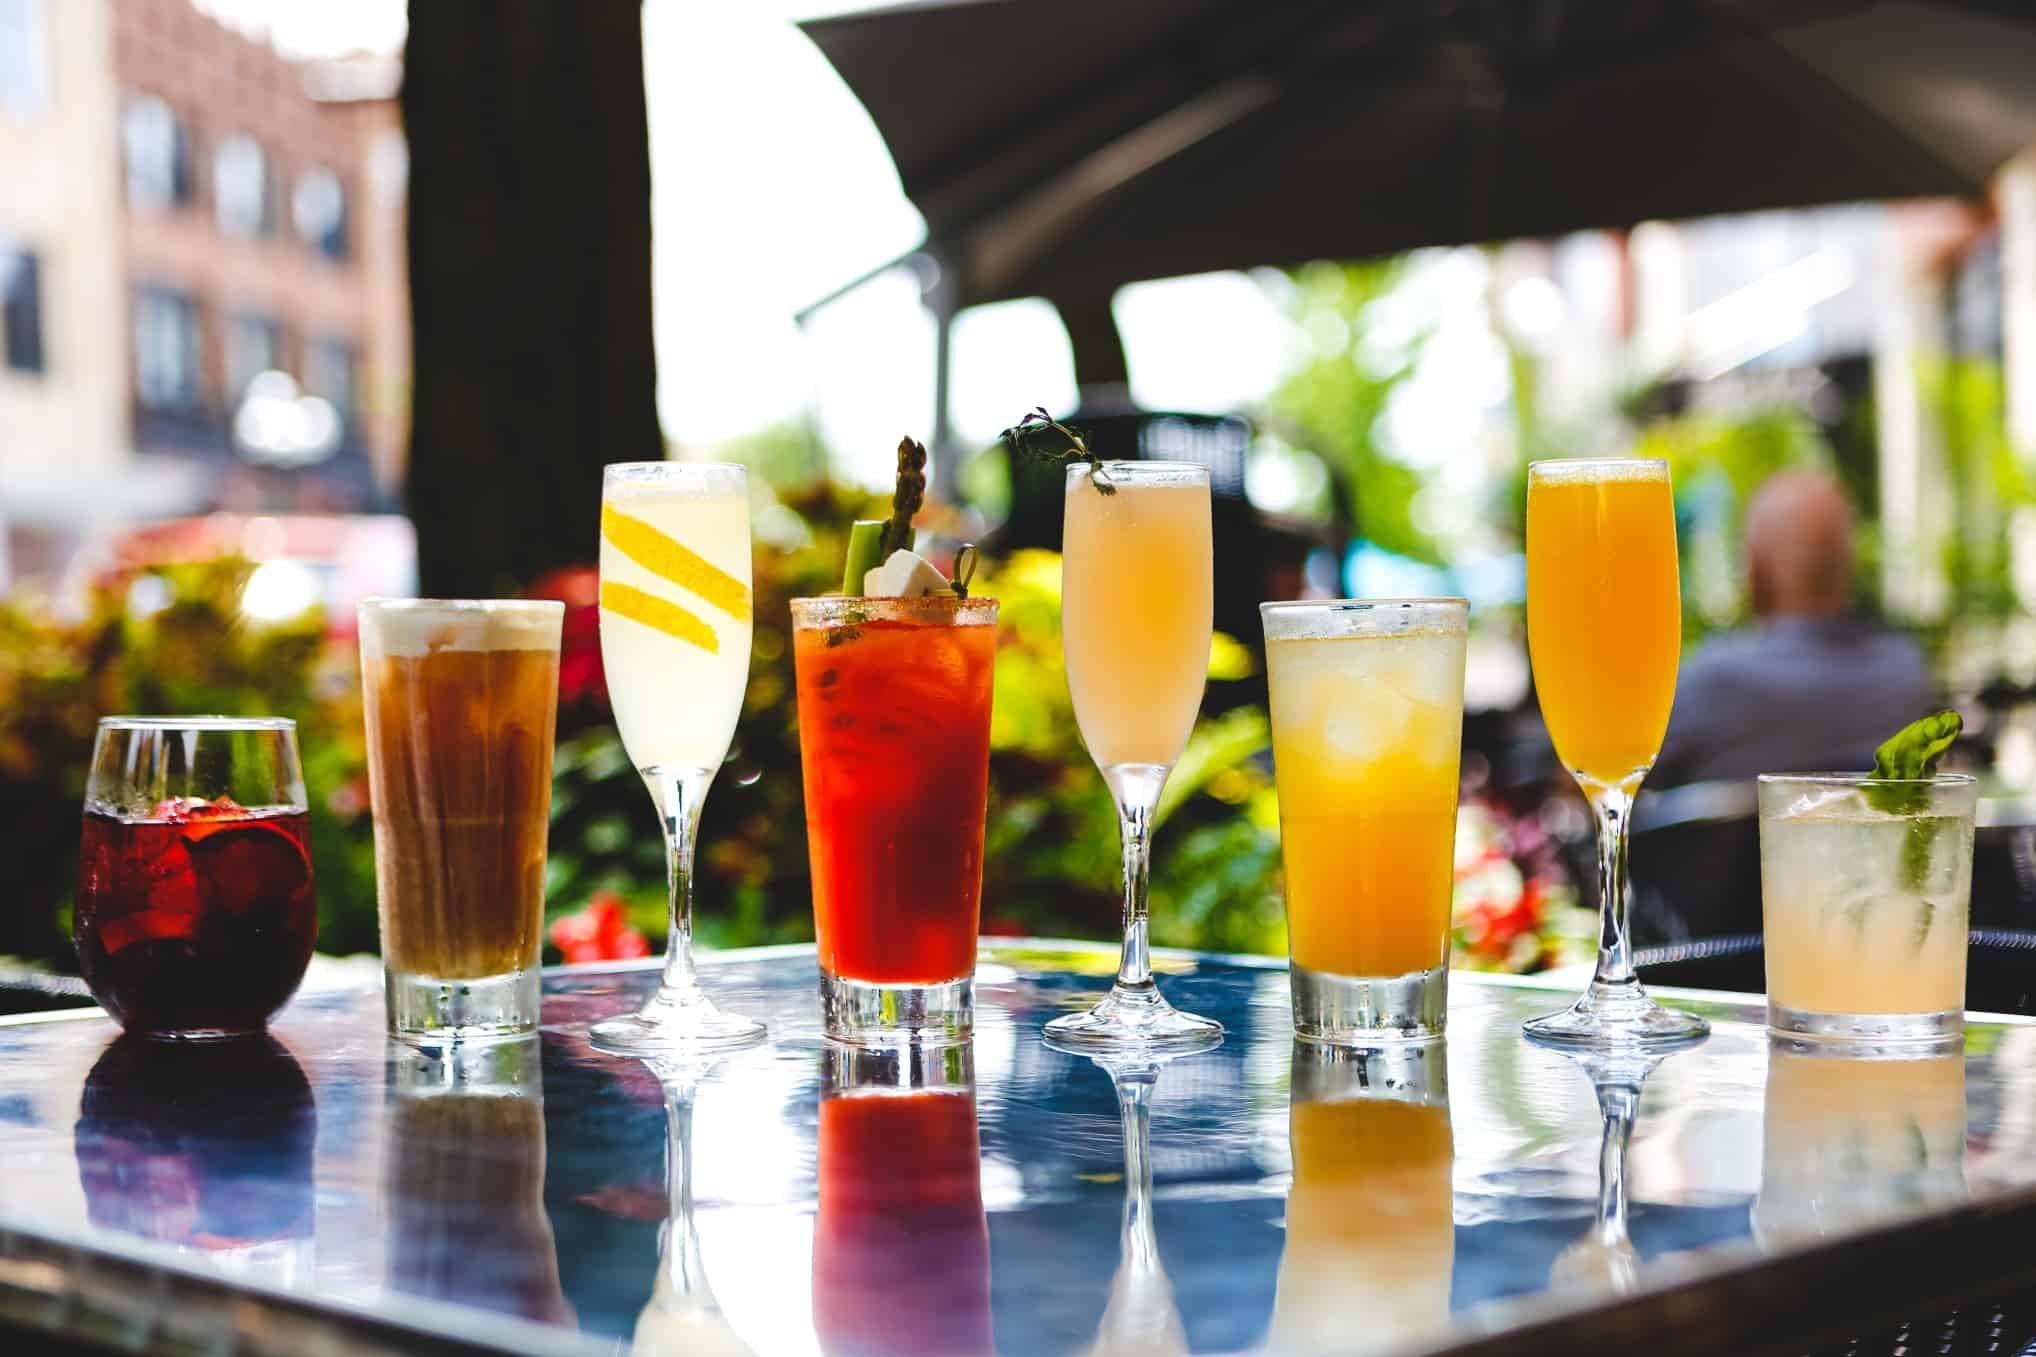 skip drinks travel advice